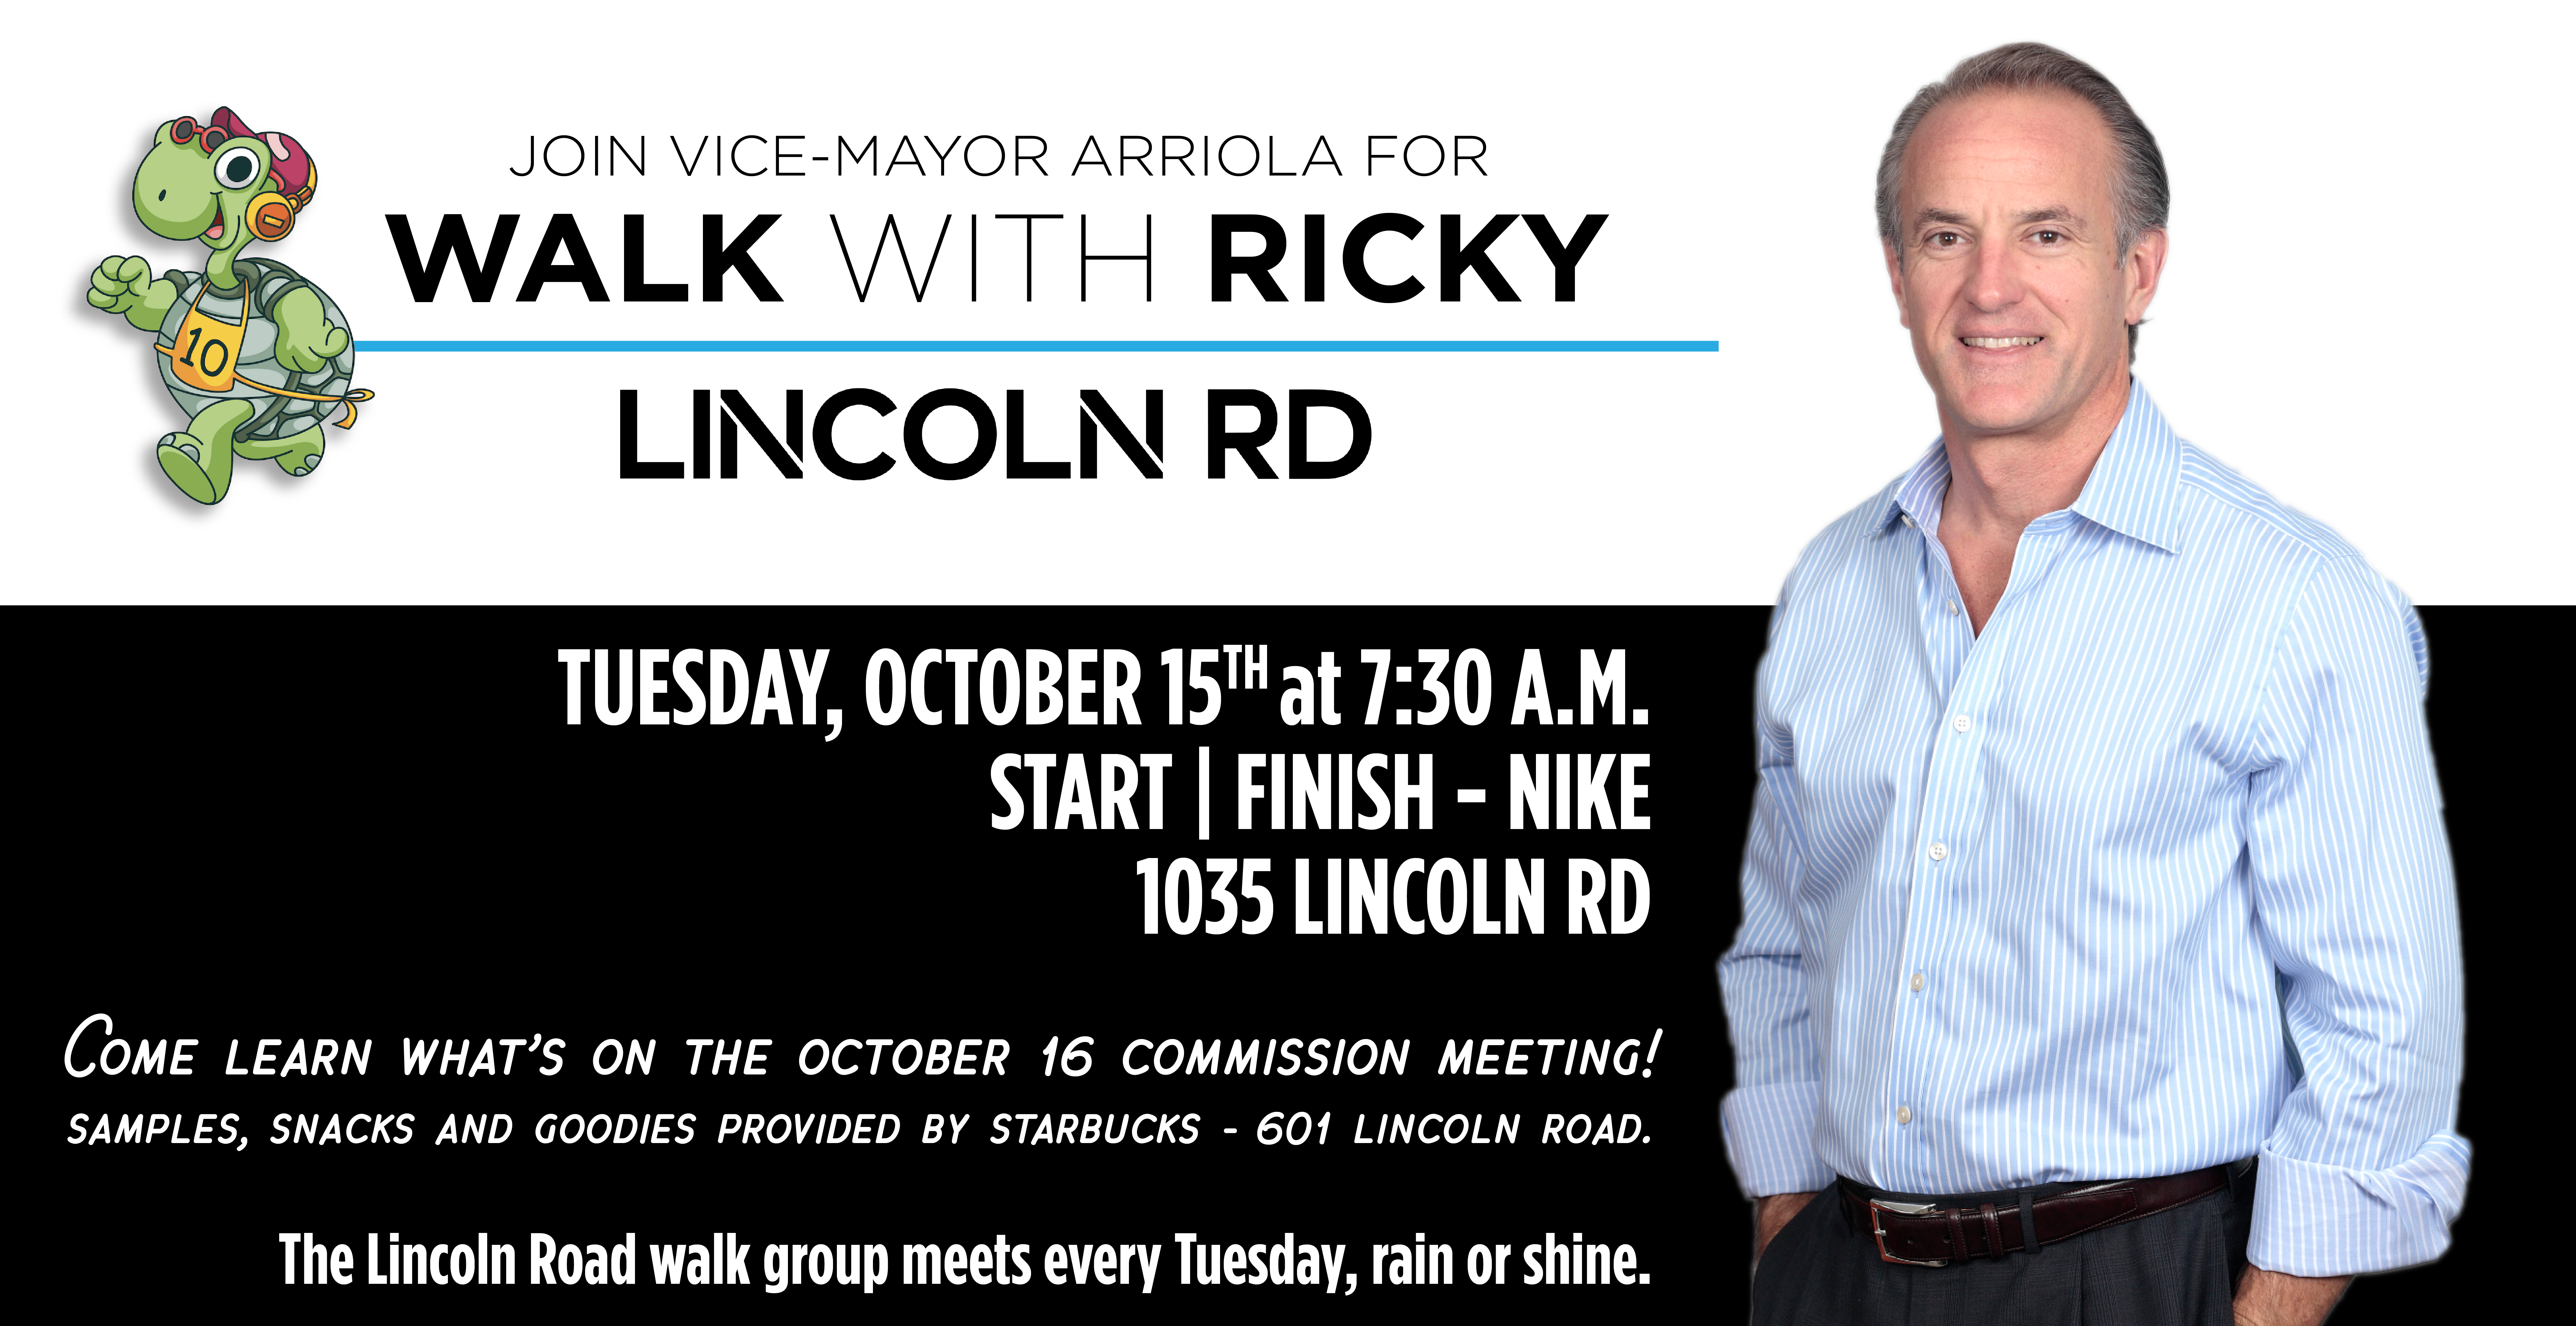 Walk with Ricky